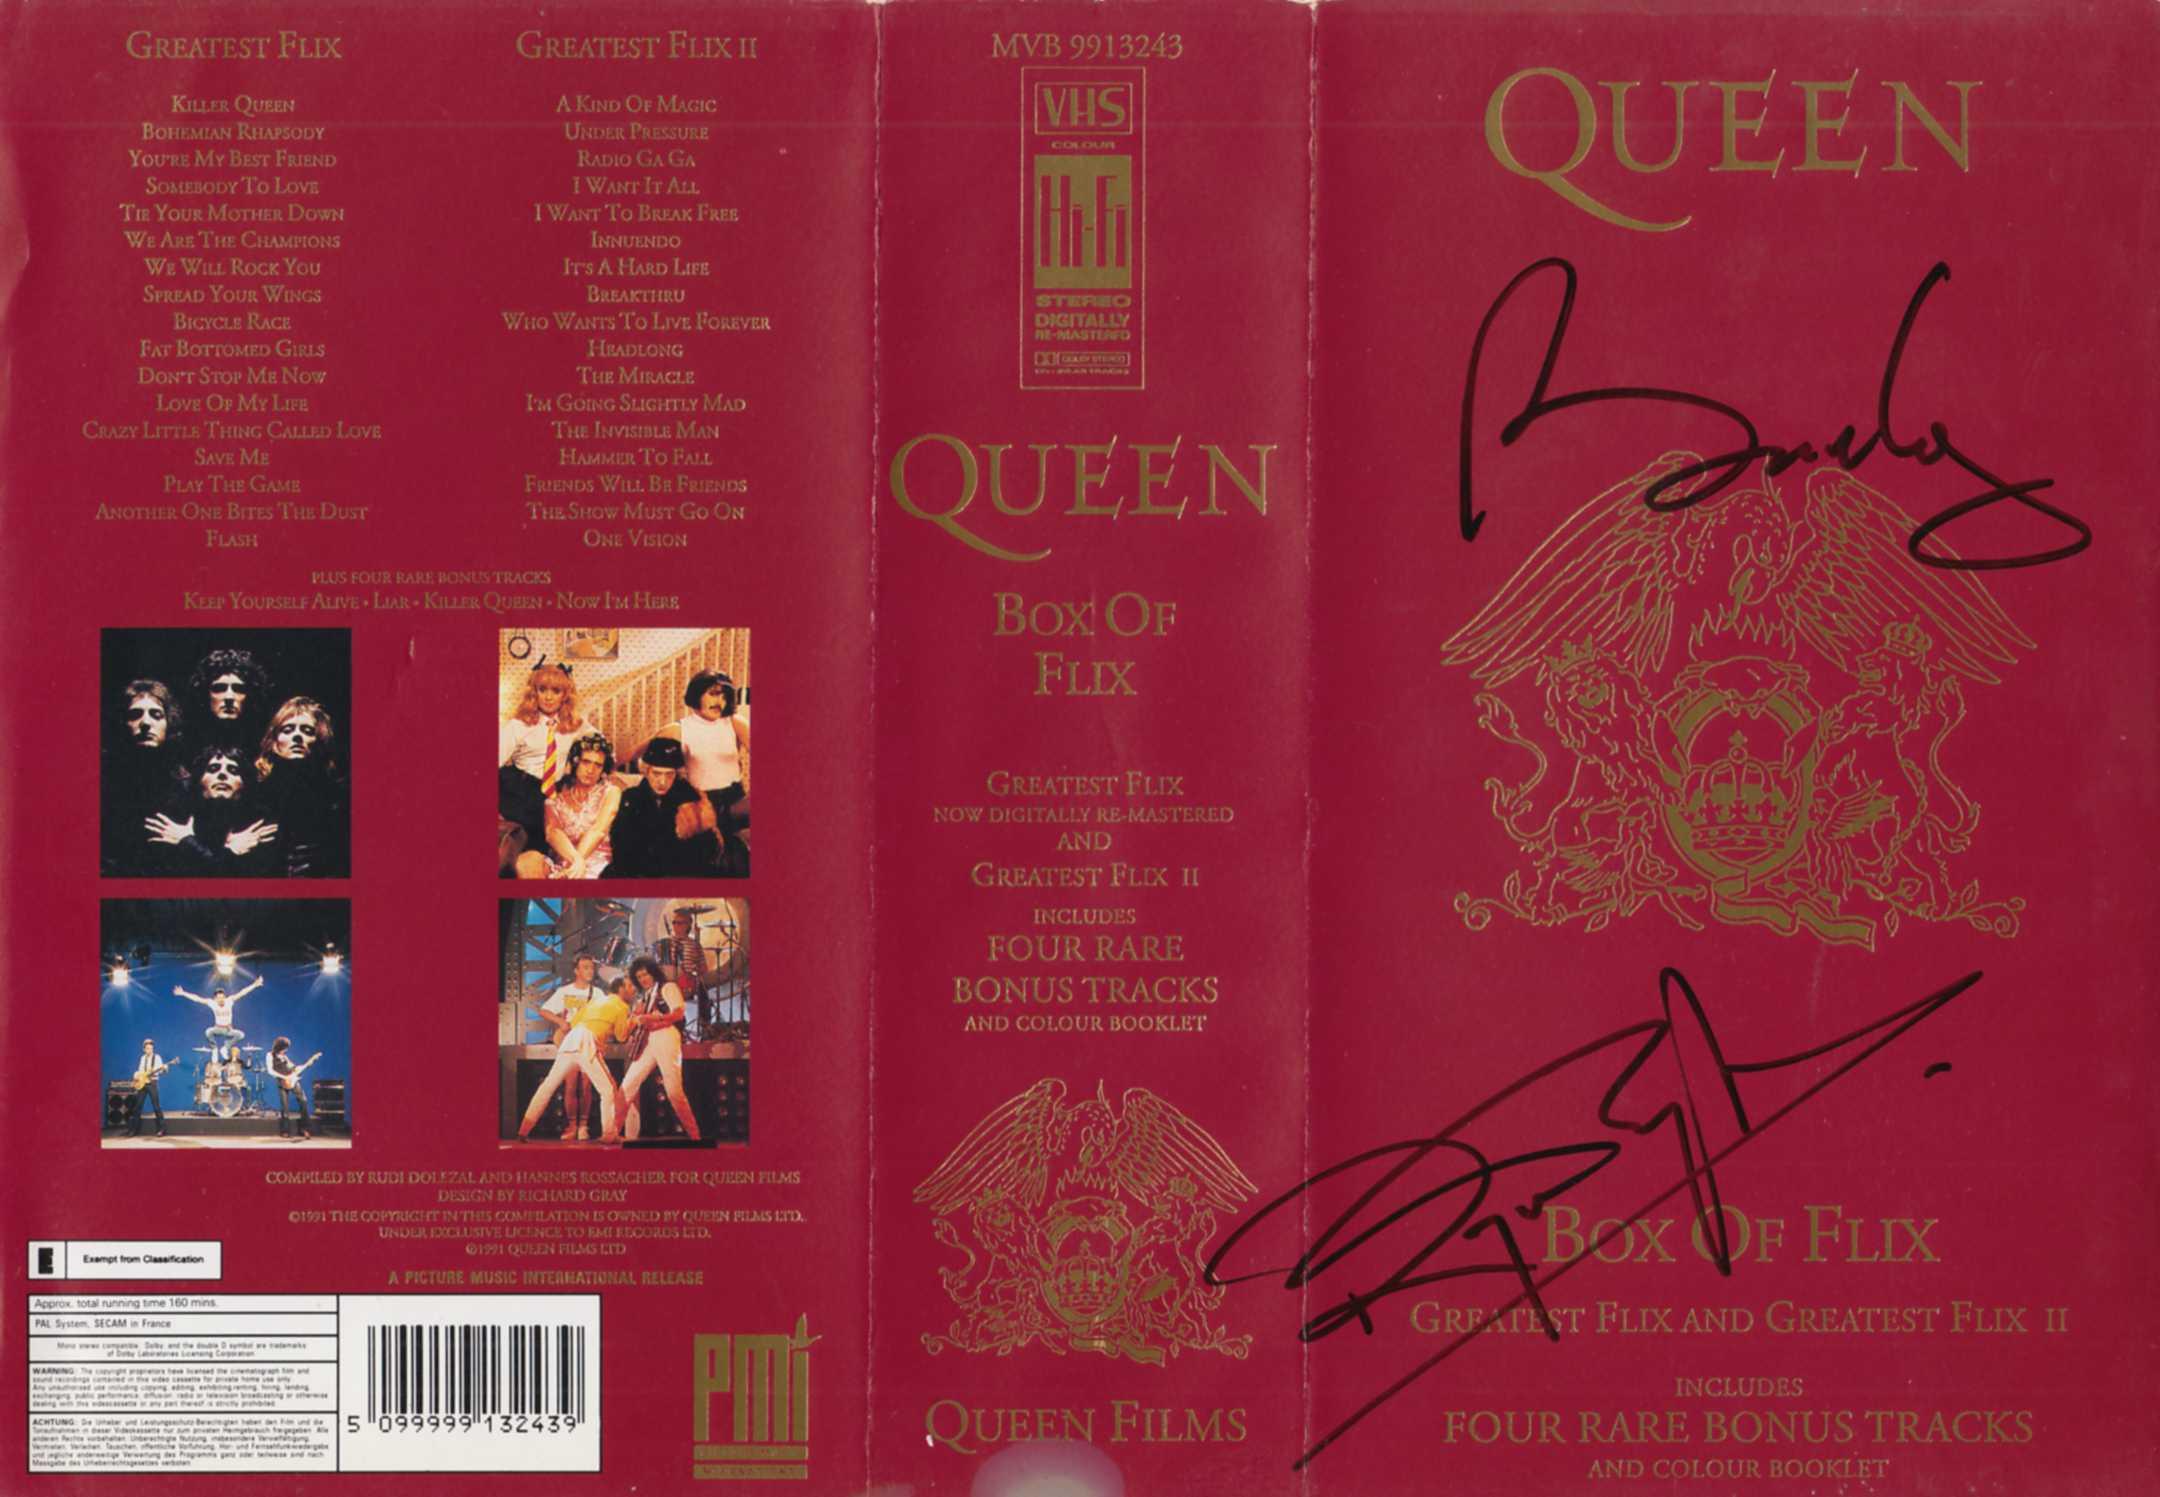 Latest Autographed rarities including Queen, Elvis Costello